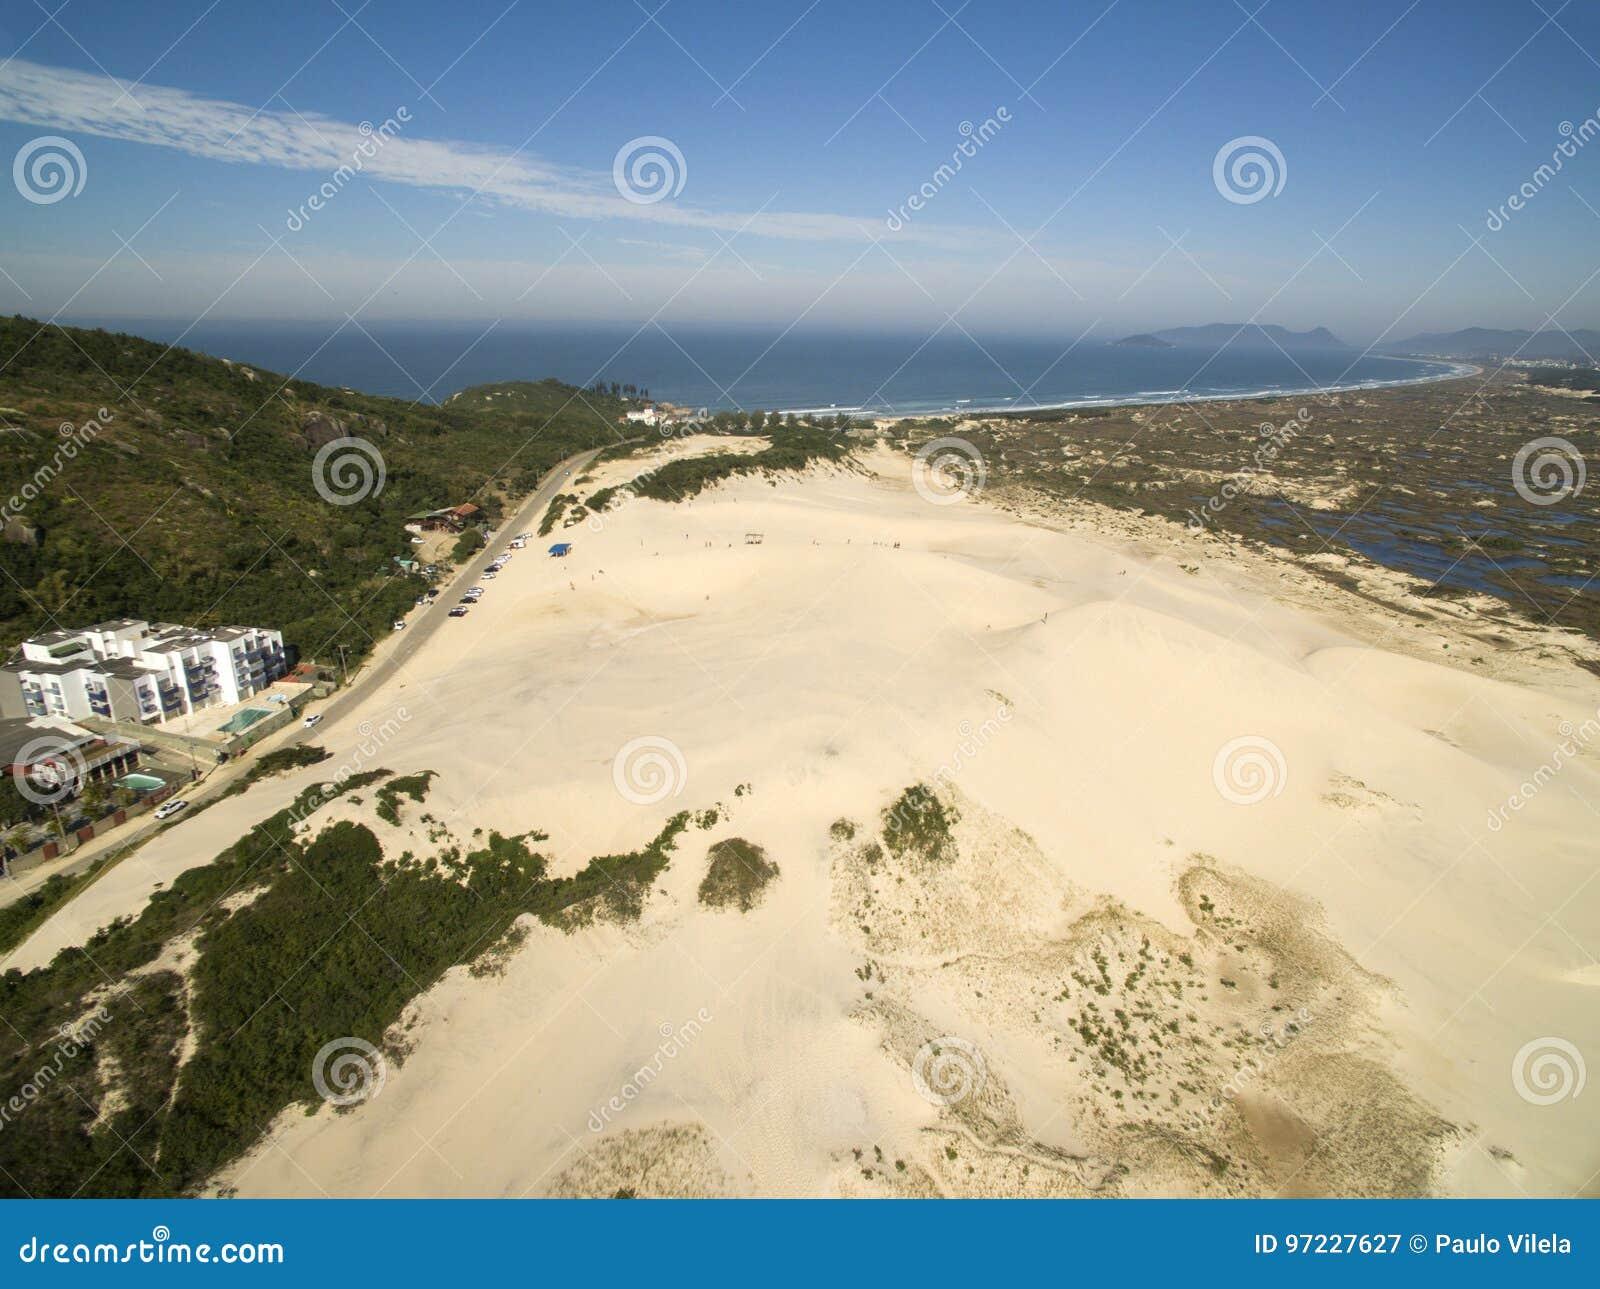 Aerial view Dunes in sunny day - Joaquina beach - Florianopolis - Santa Catarina - Brazil. July 2017